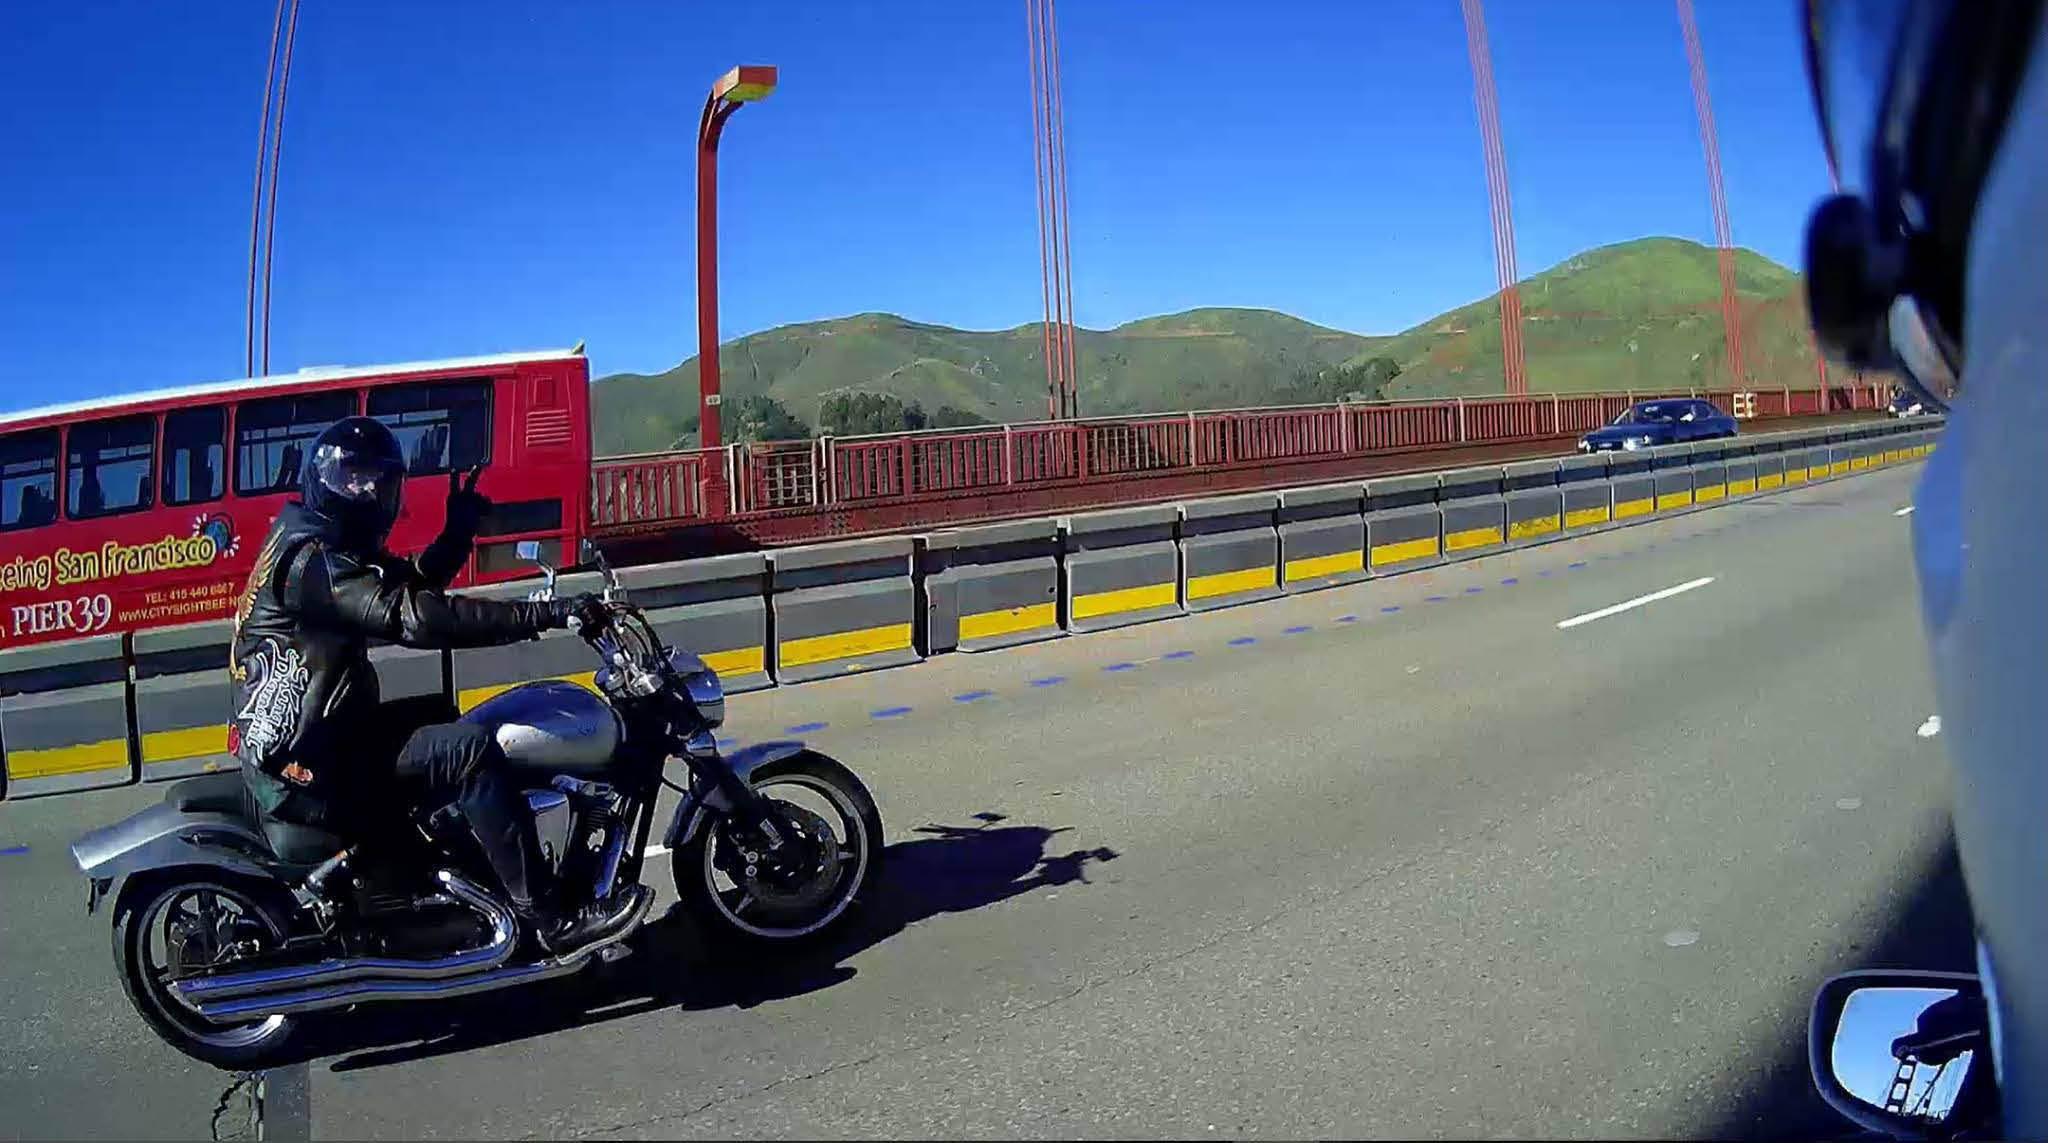 Riding gear, leather jacket near San Lorenzo